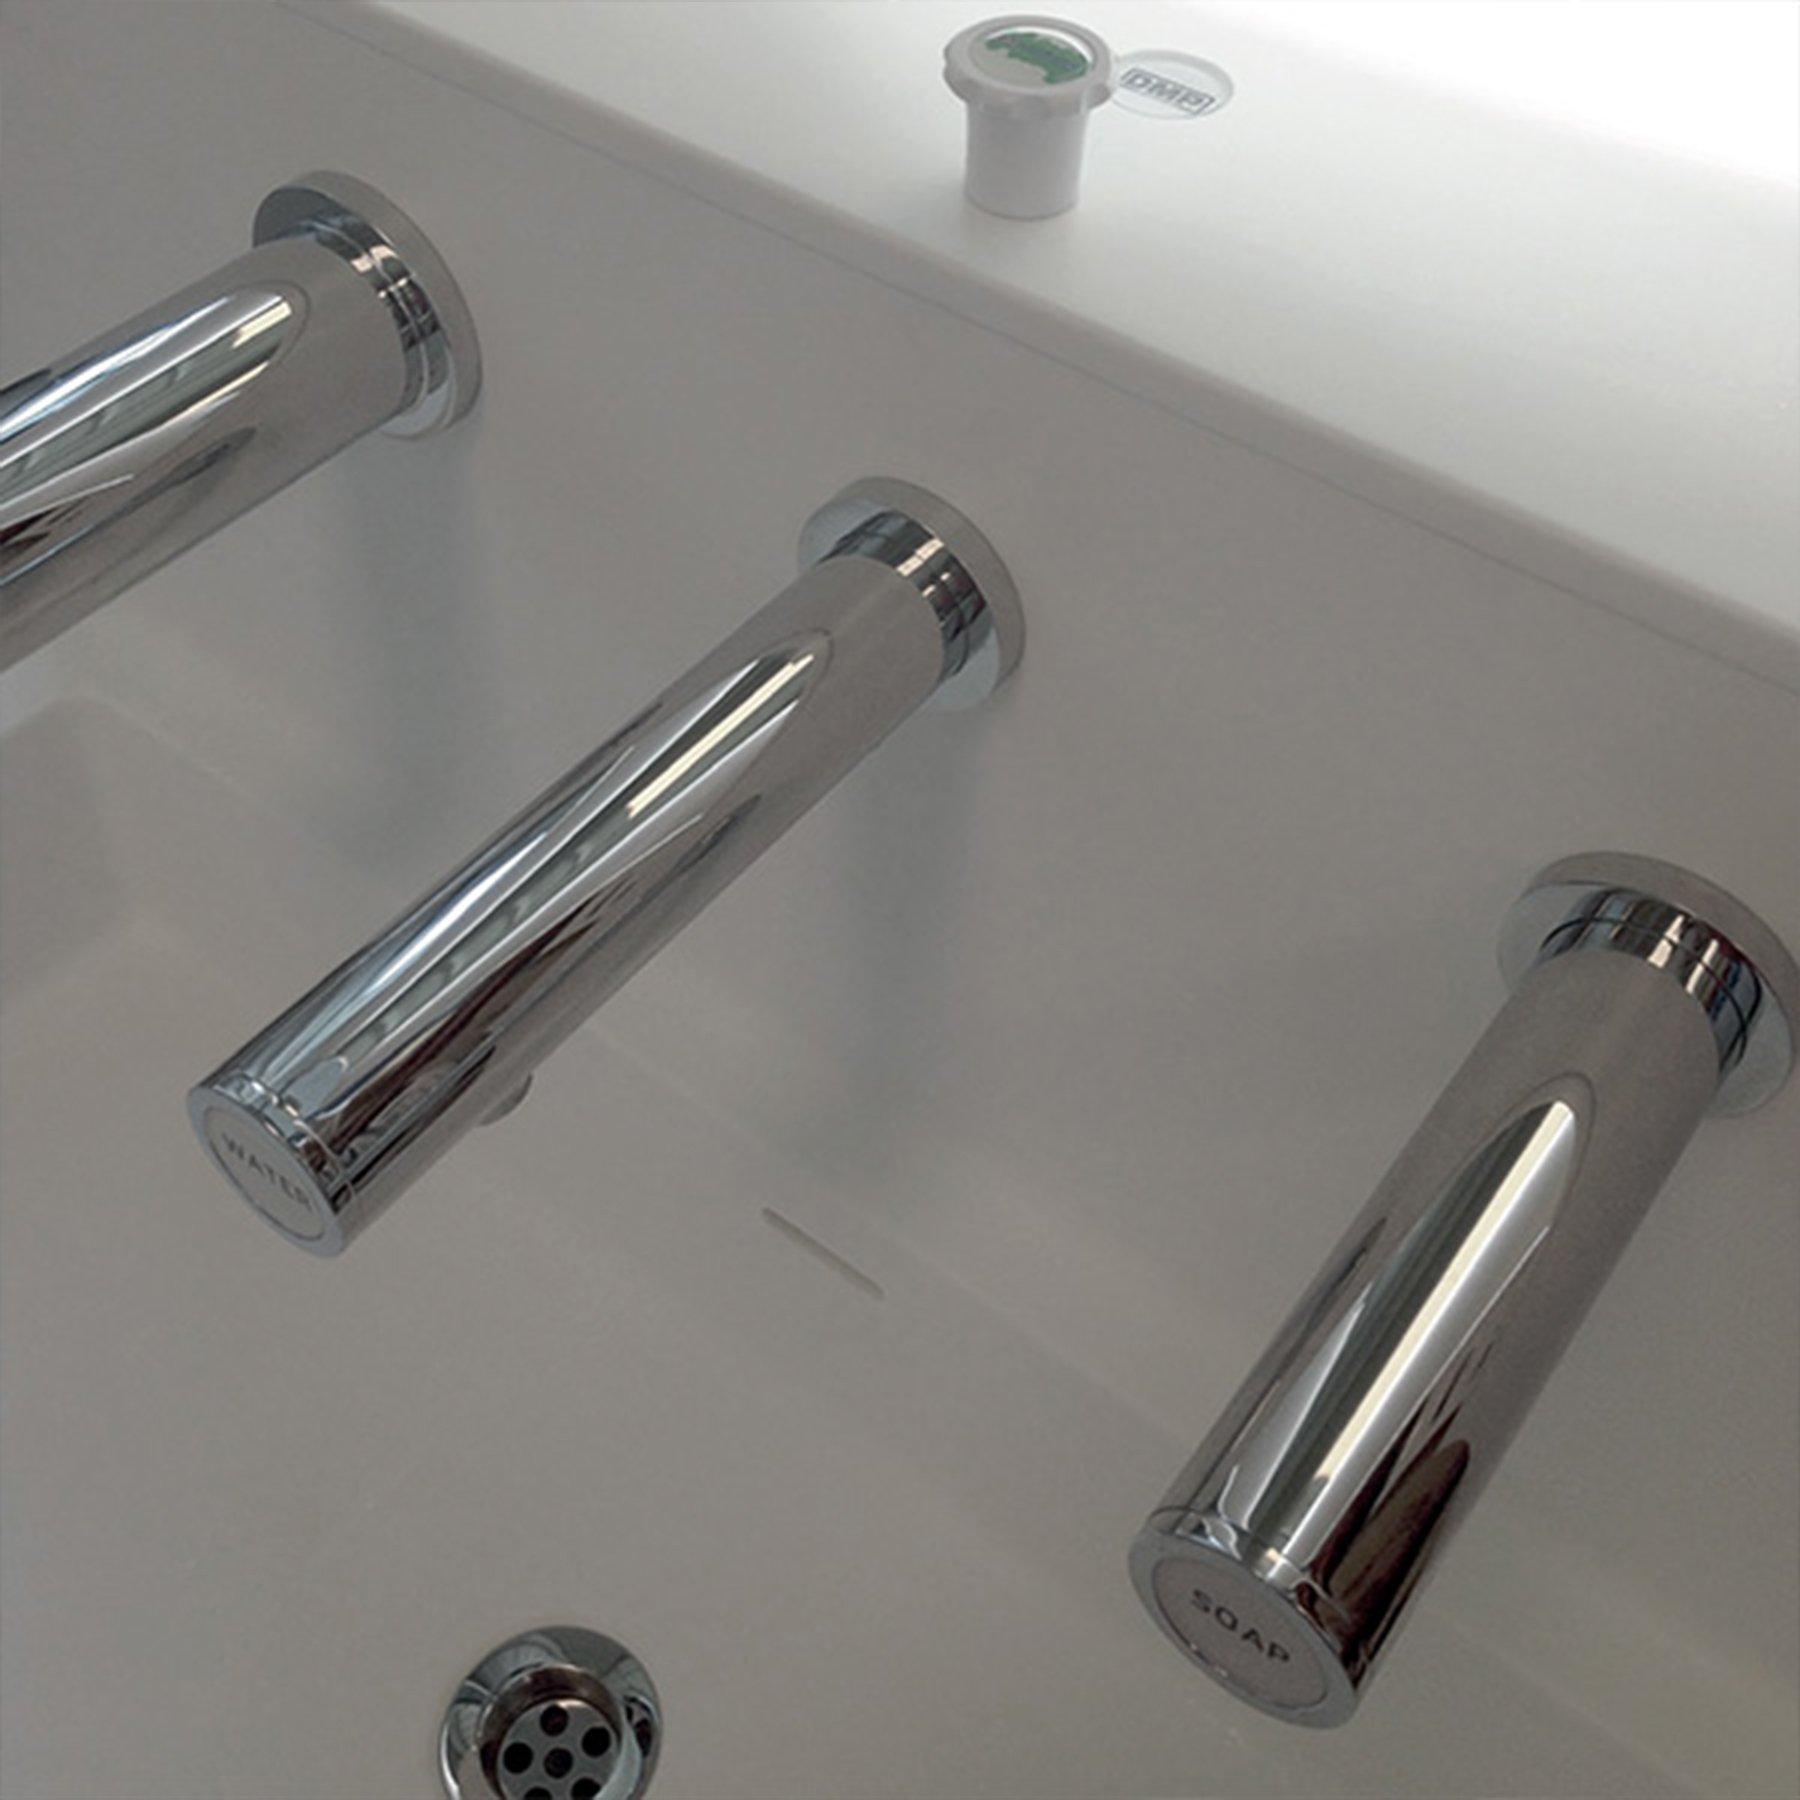 washroom-solutions-aqualogic